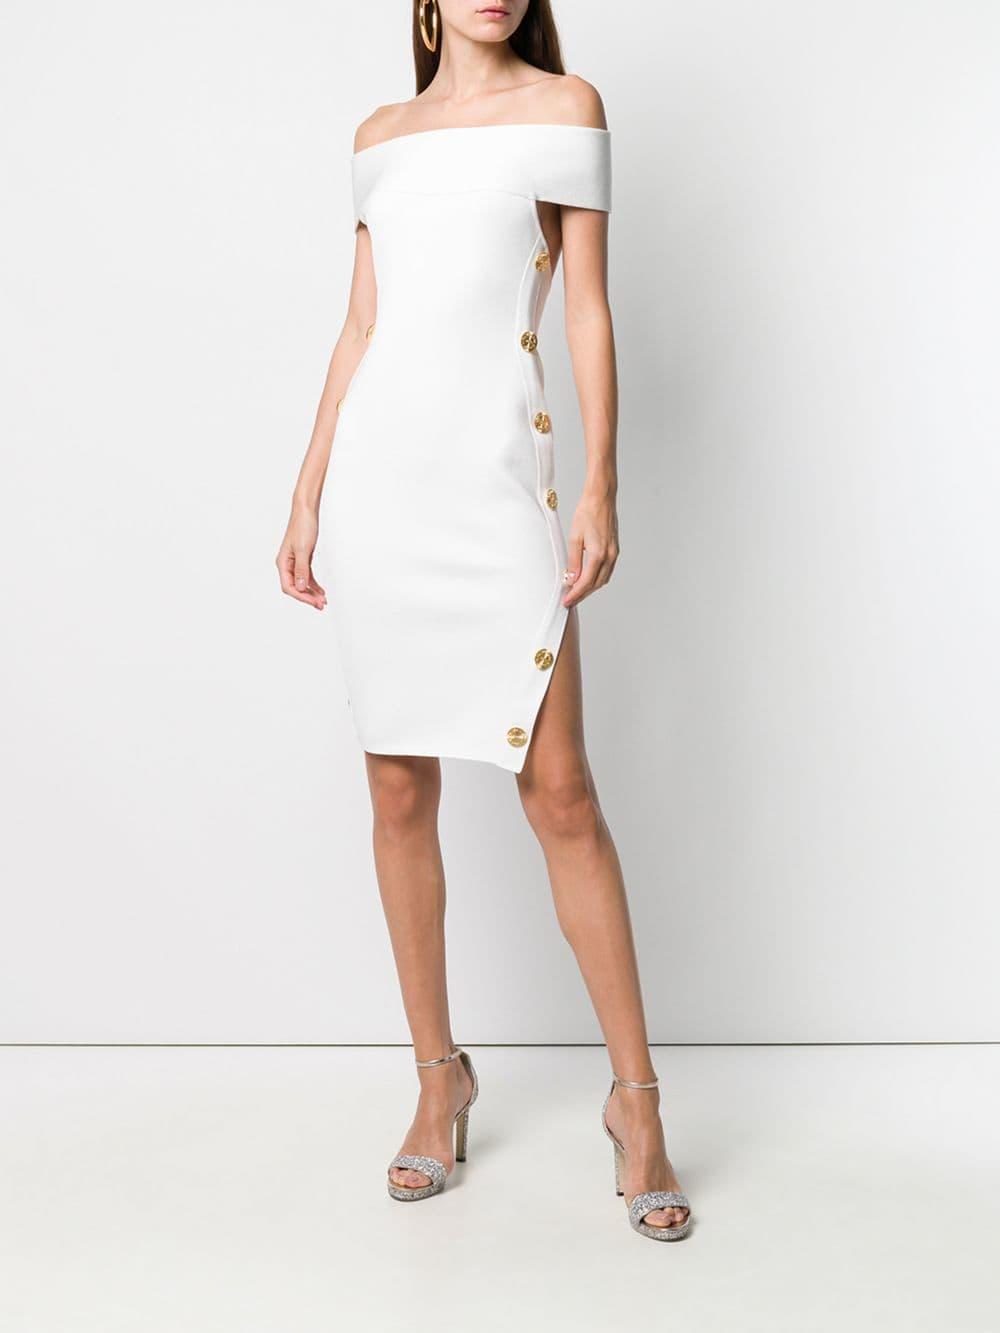 ebb4eaa4f2d0 Alexandre Vauthier Bardot Side Button Cutout Dress in White - Lyst